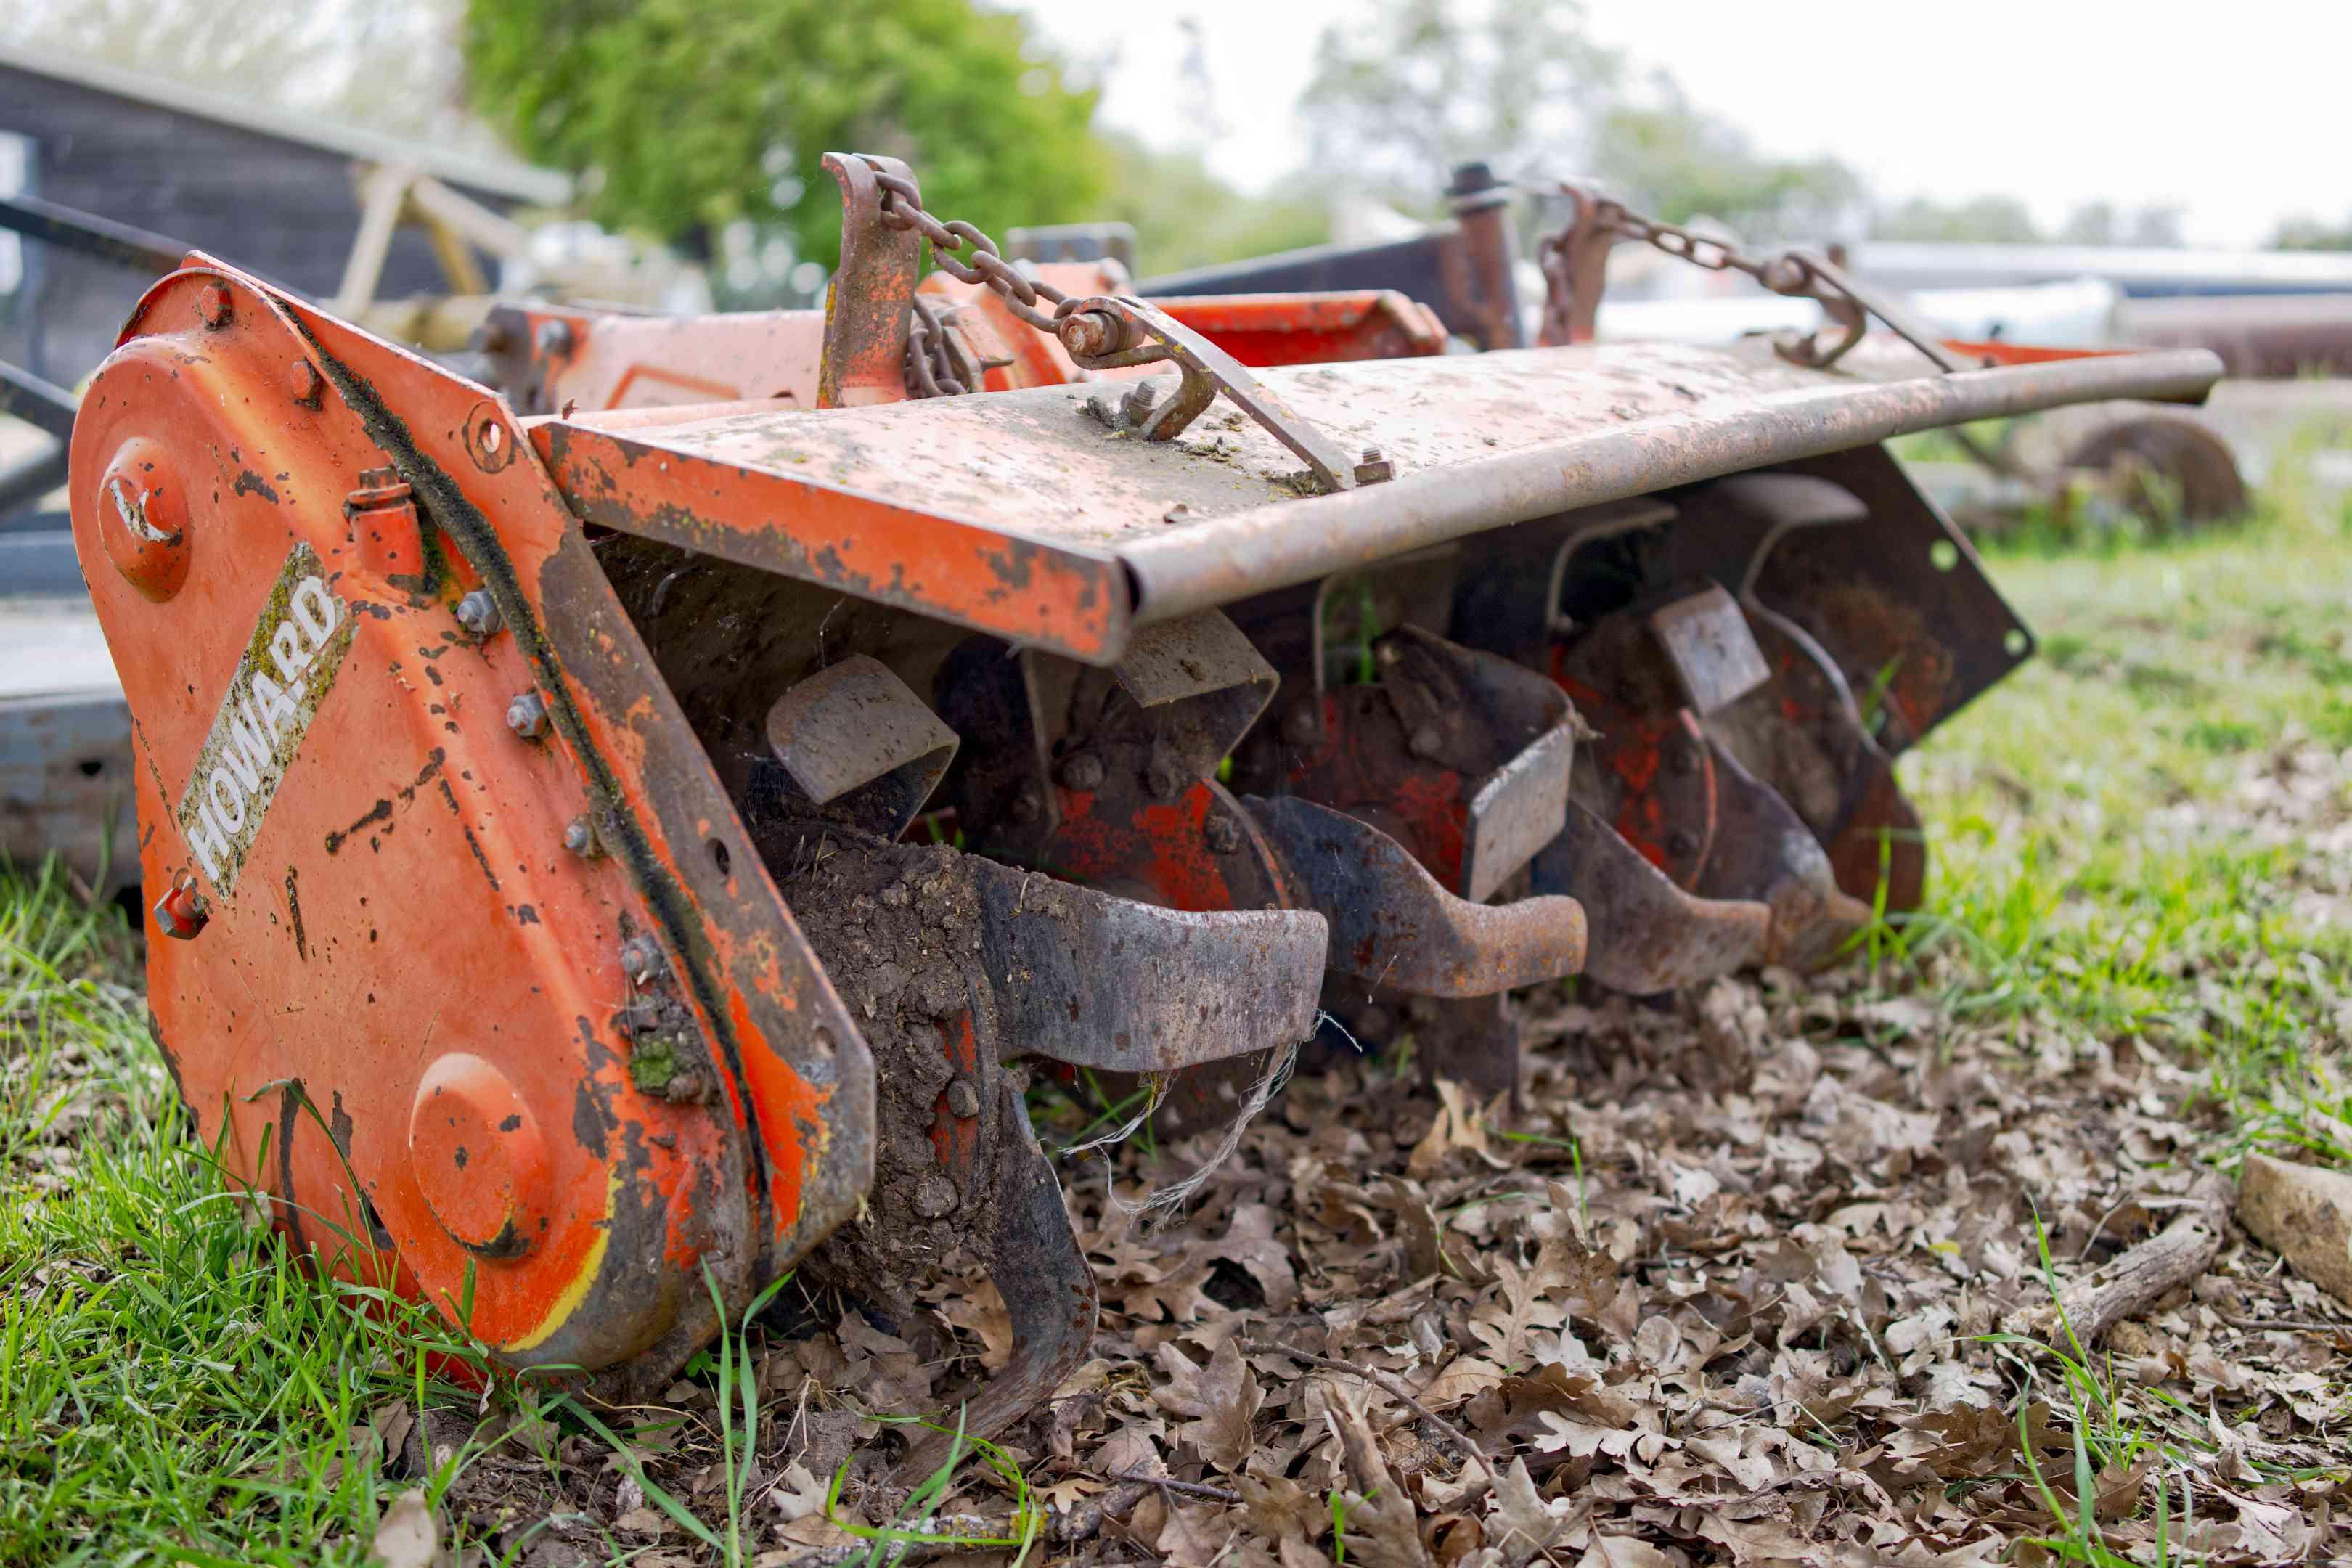 close low-ground shot of orange metal PTO tiller farm equipment breaking up soil